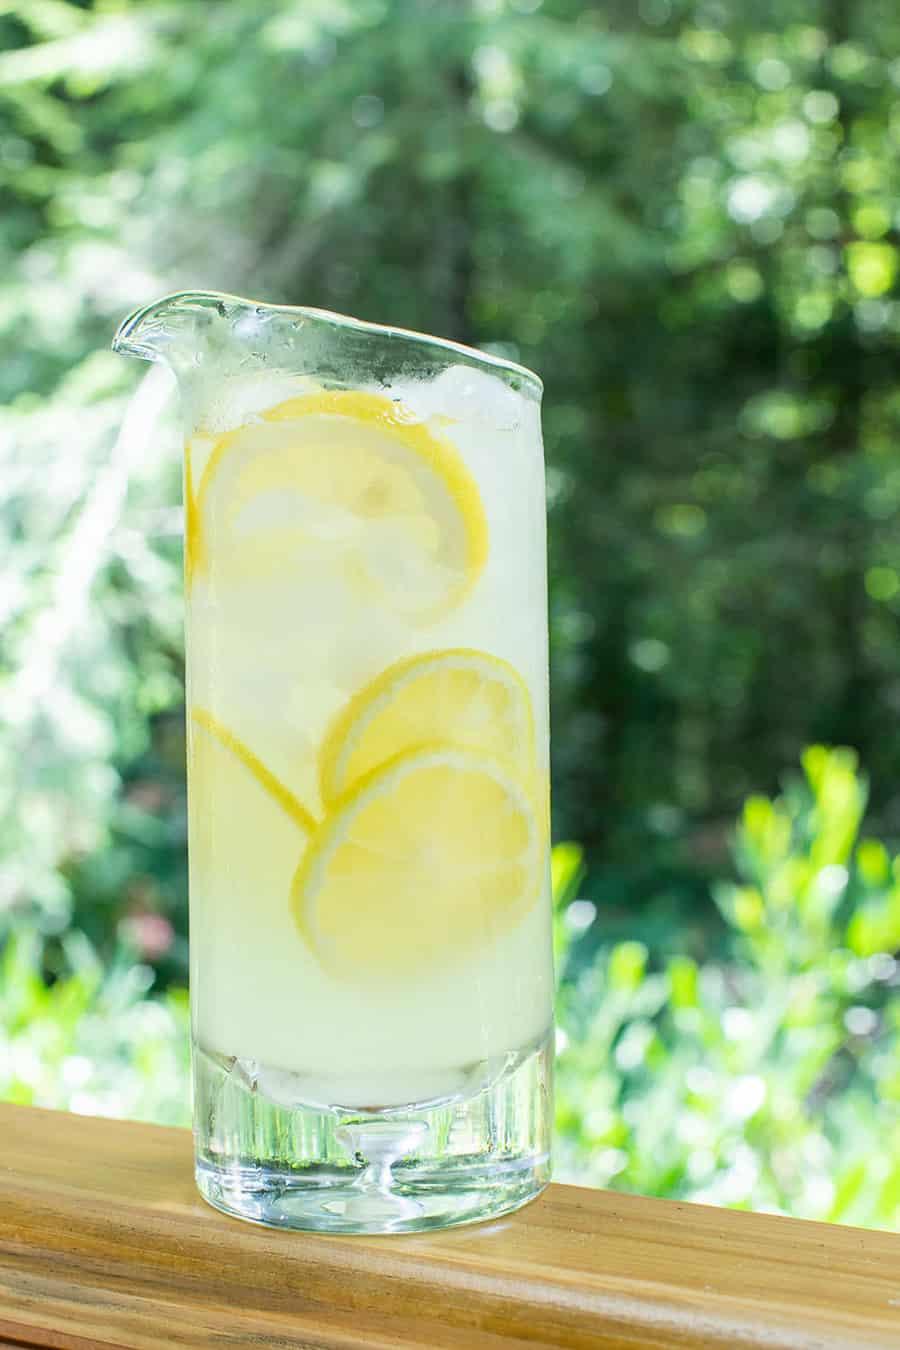 Homemade lemonade to make an Arnold Palmer